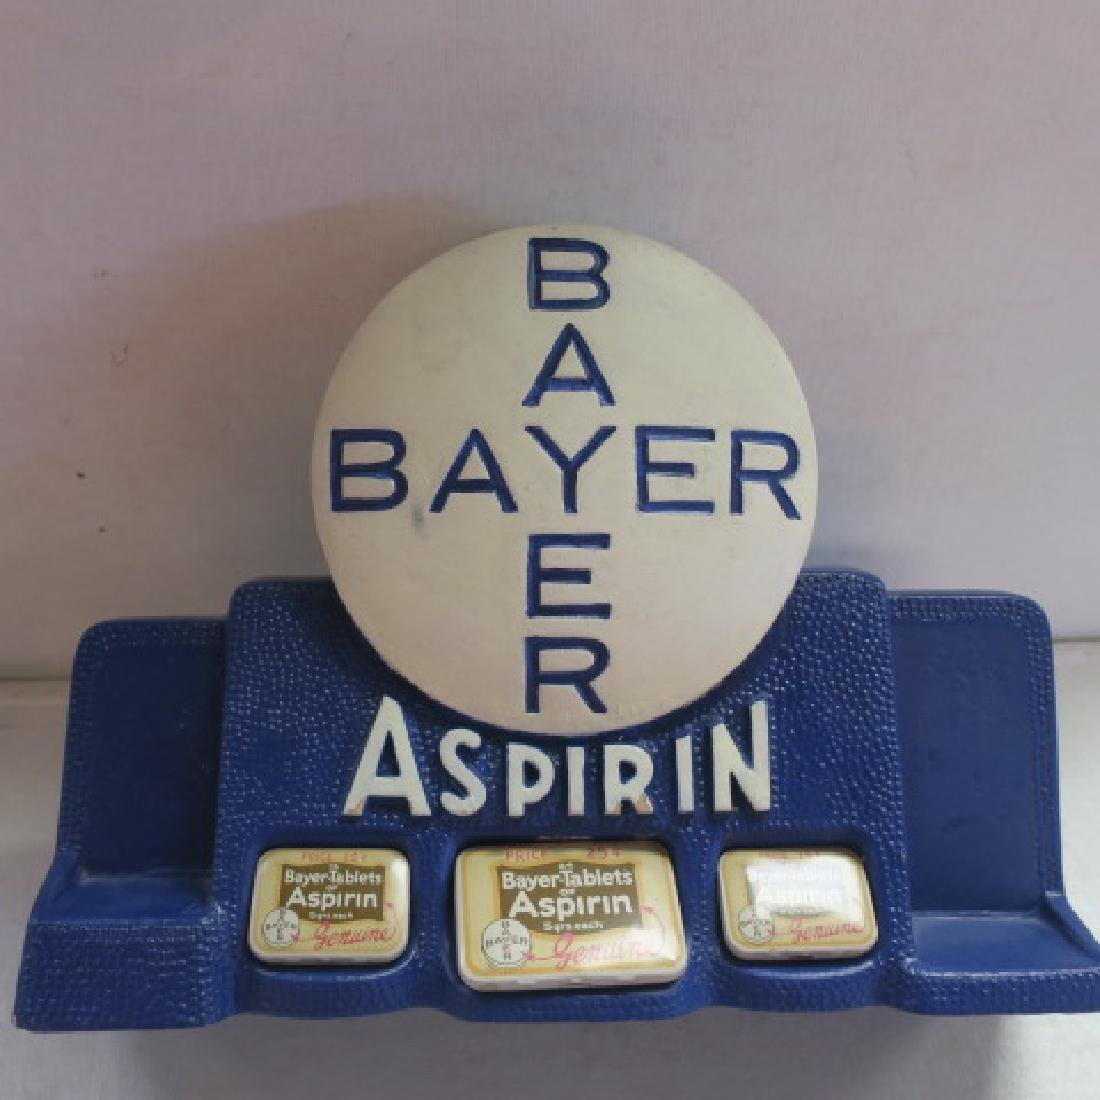 BAYER ASPIRIN Tablets Tin Counter Display: - 2